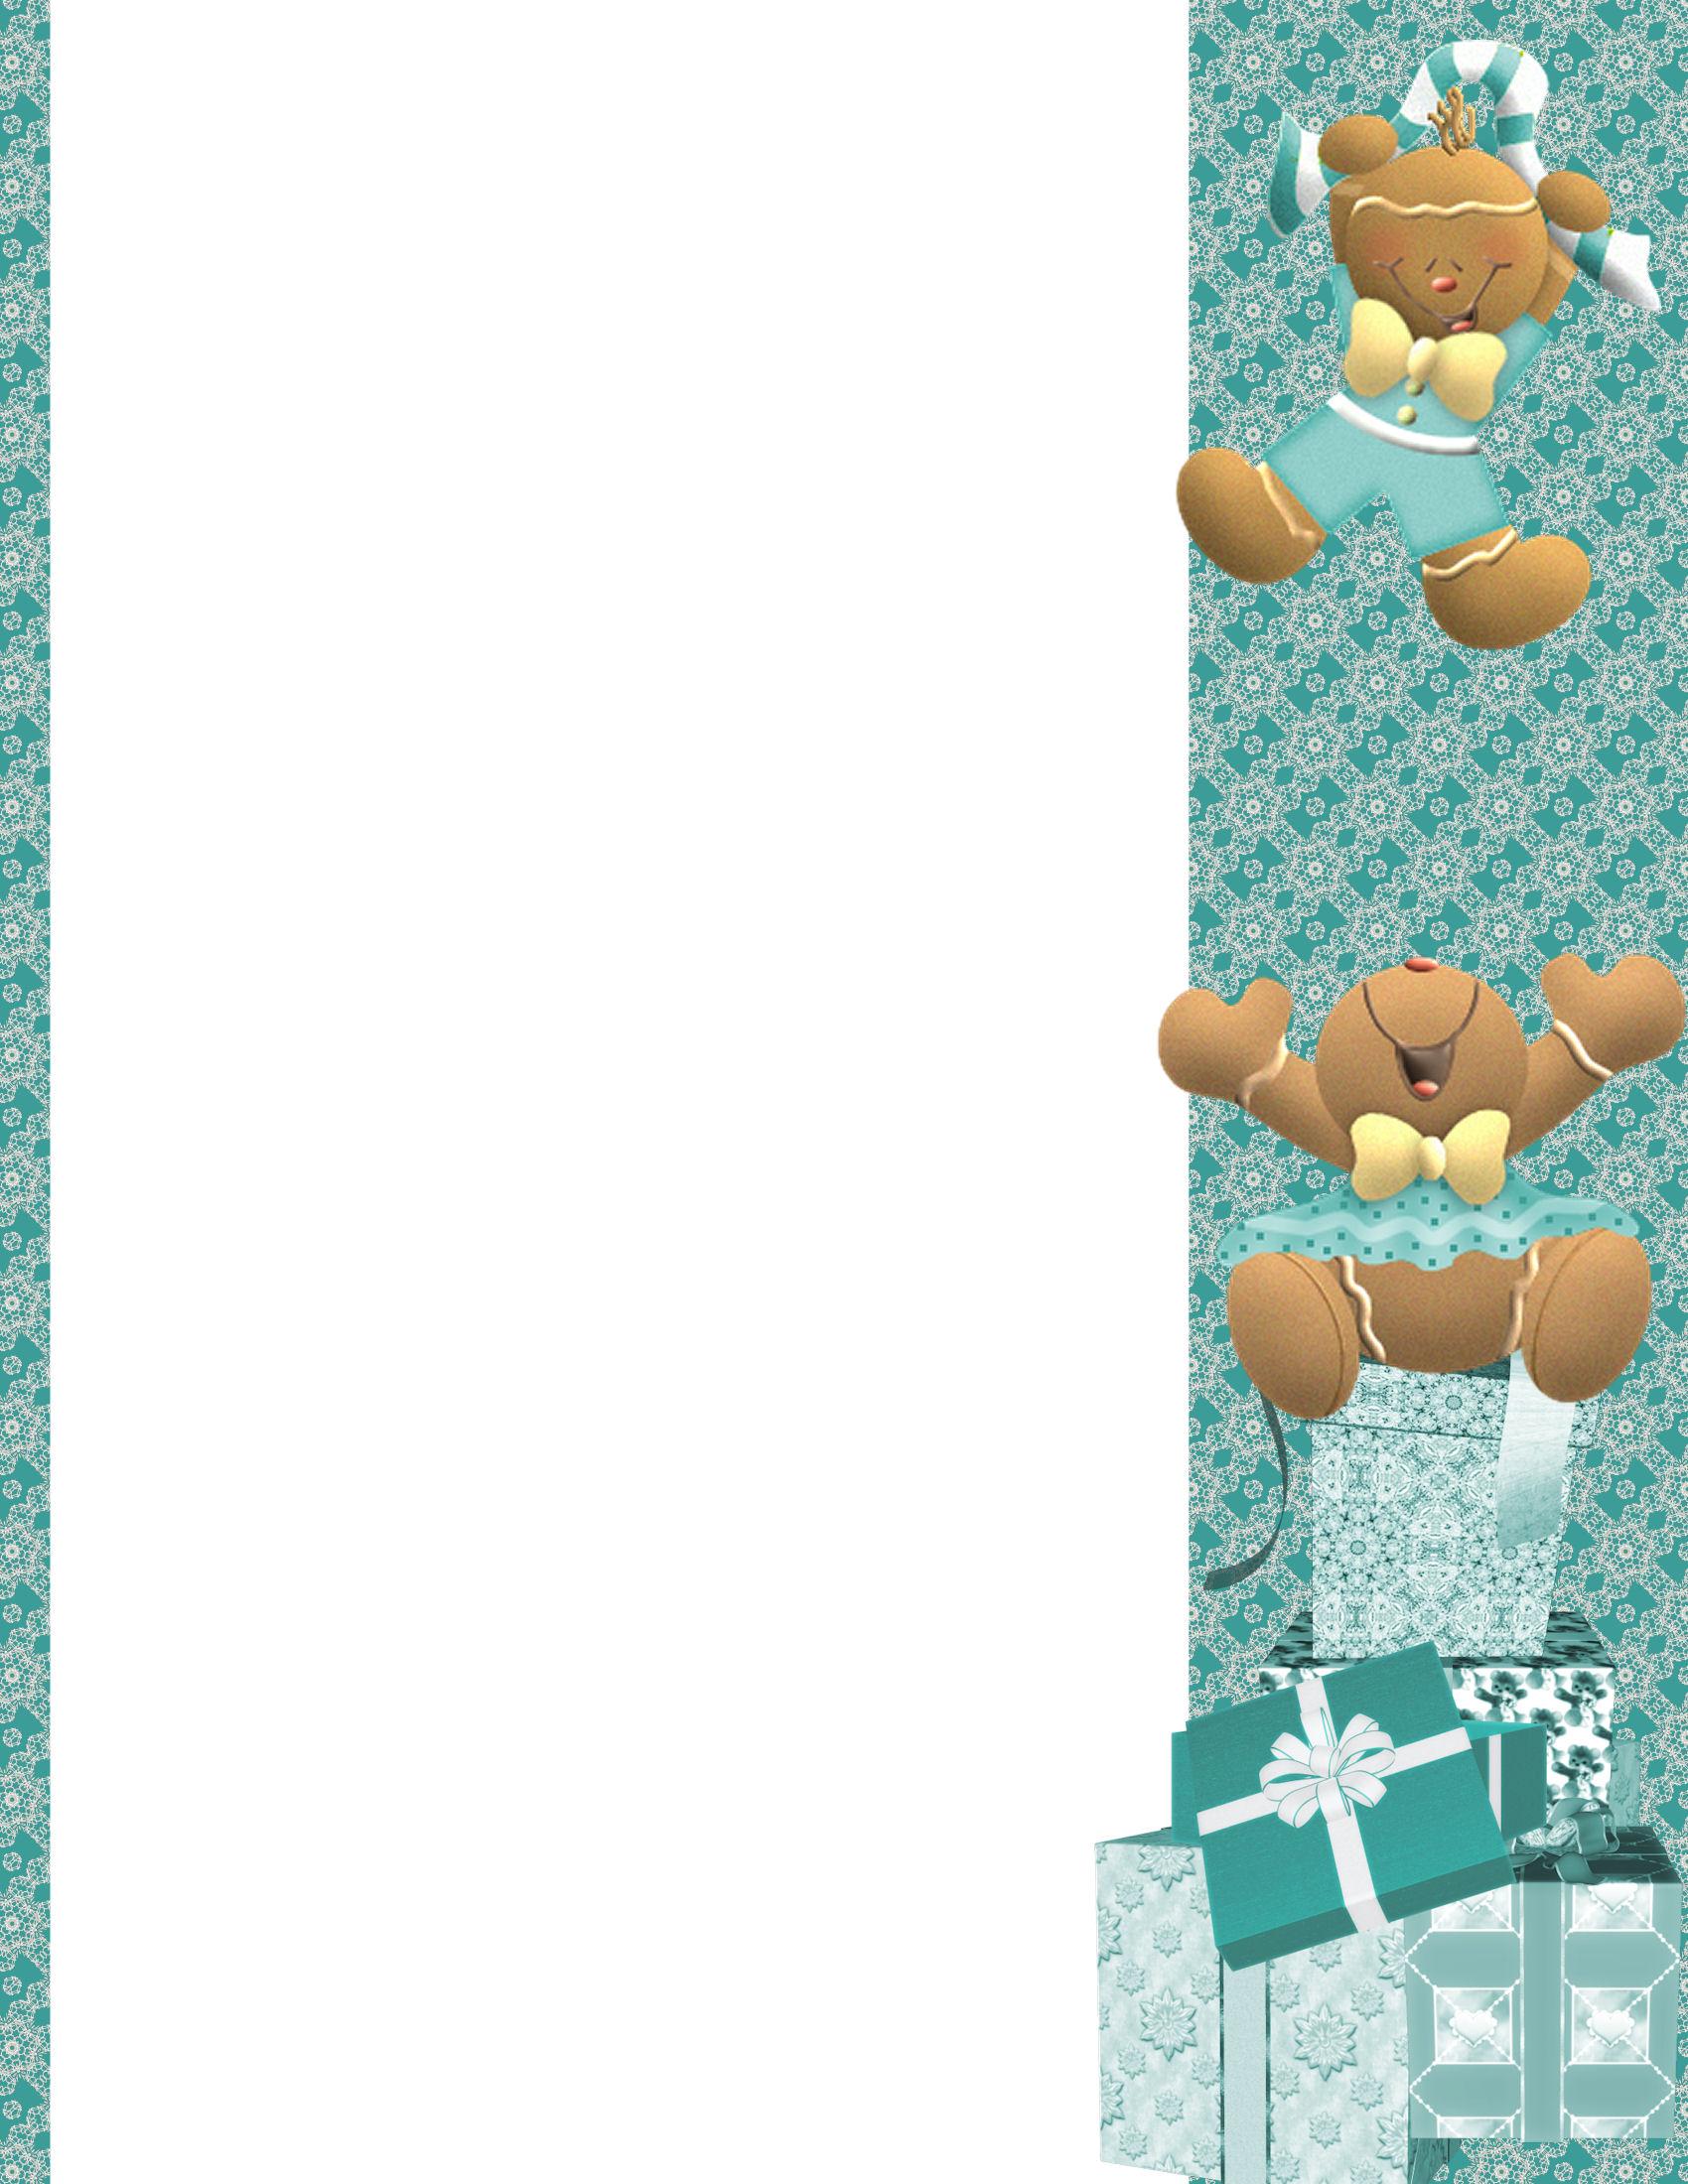 christmas 1 free stationery com template downloads